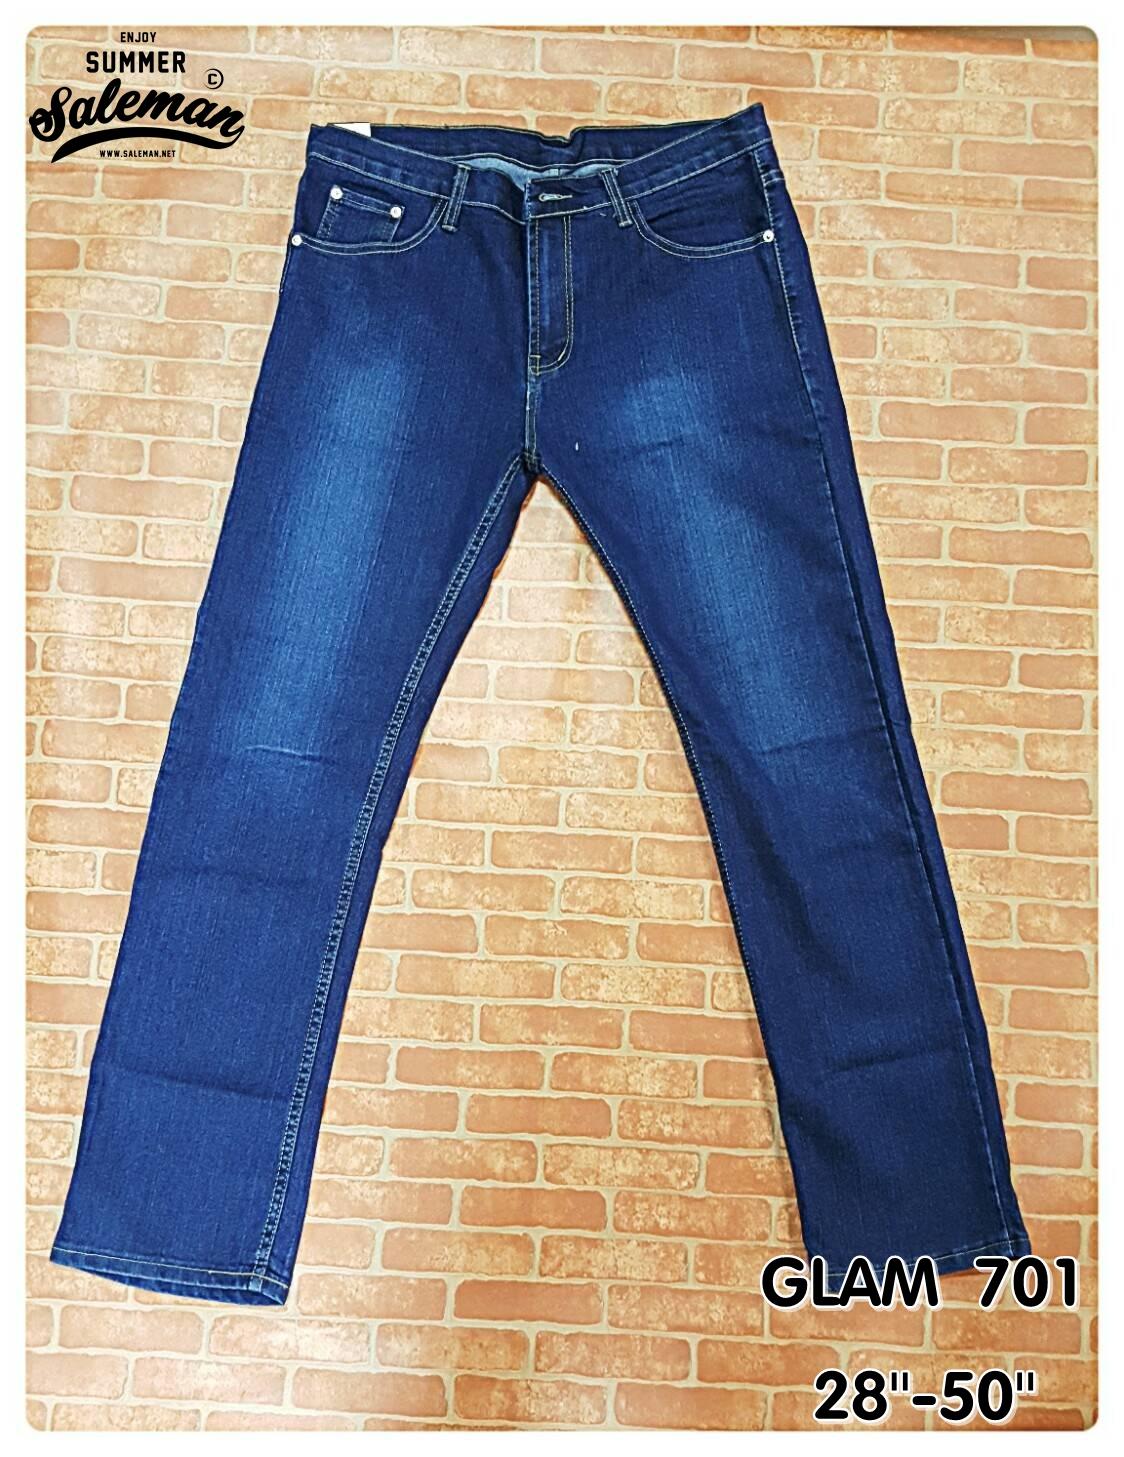 GLAM 701 กางเกงยีนส์ขายาว ขายกางเกง กางเกงคนอ้วน เสื้อผ้าคนอ้วน กางเกงขายาว กางเกงเอวใหญ่